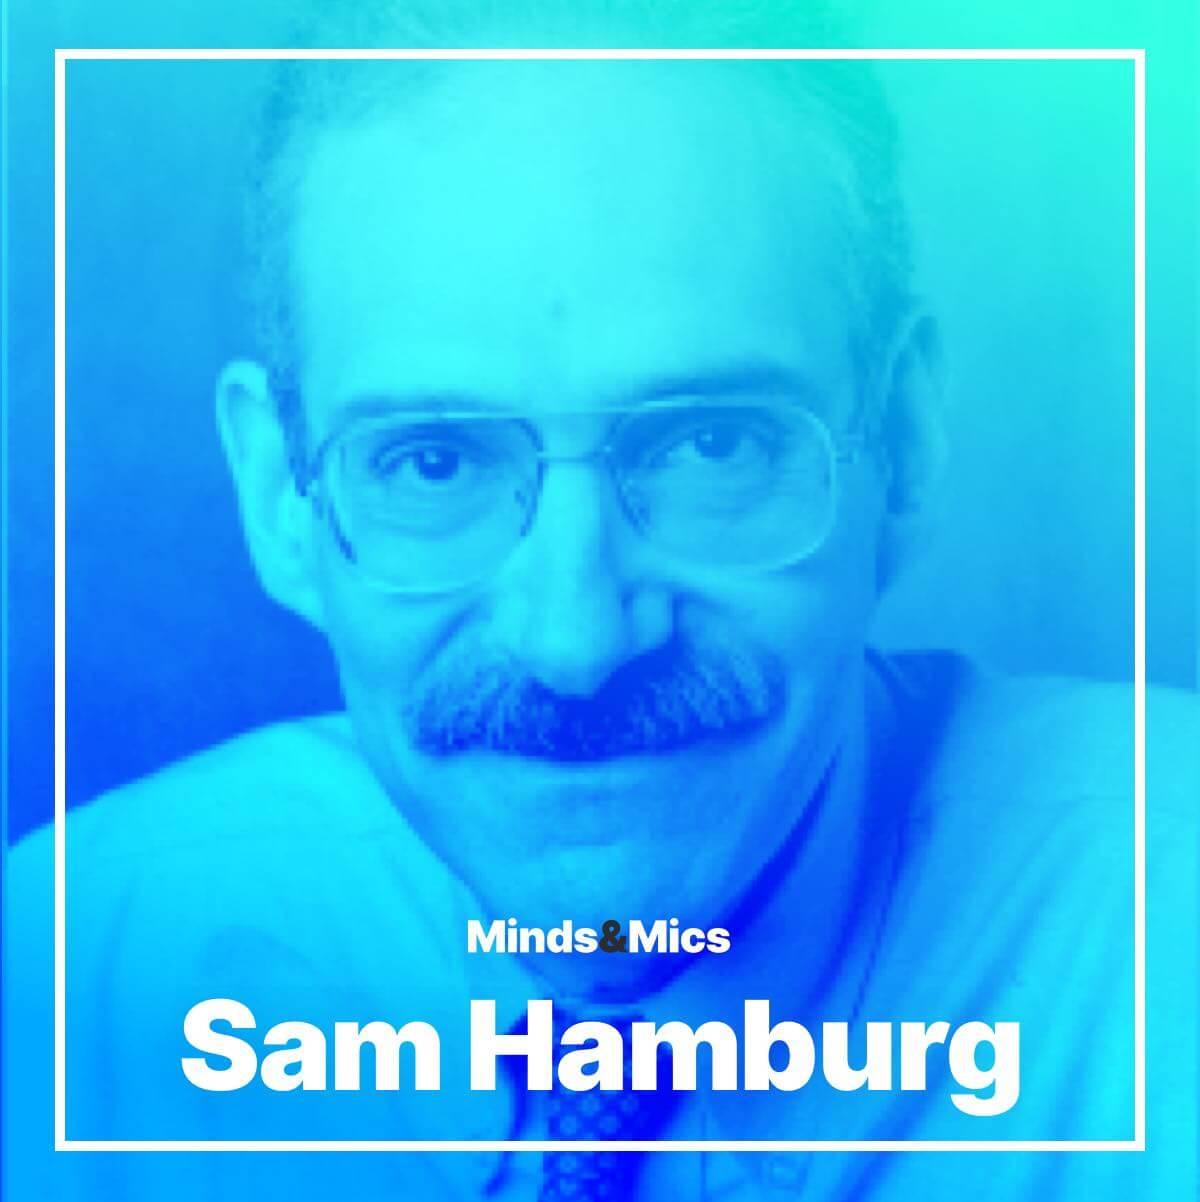 Sam Hamburg Wignall Minds and Mics